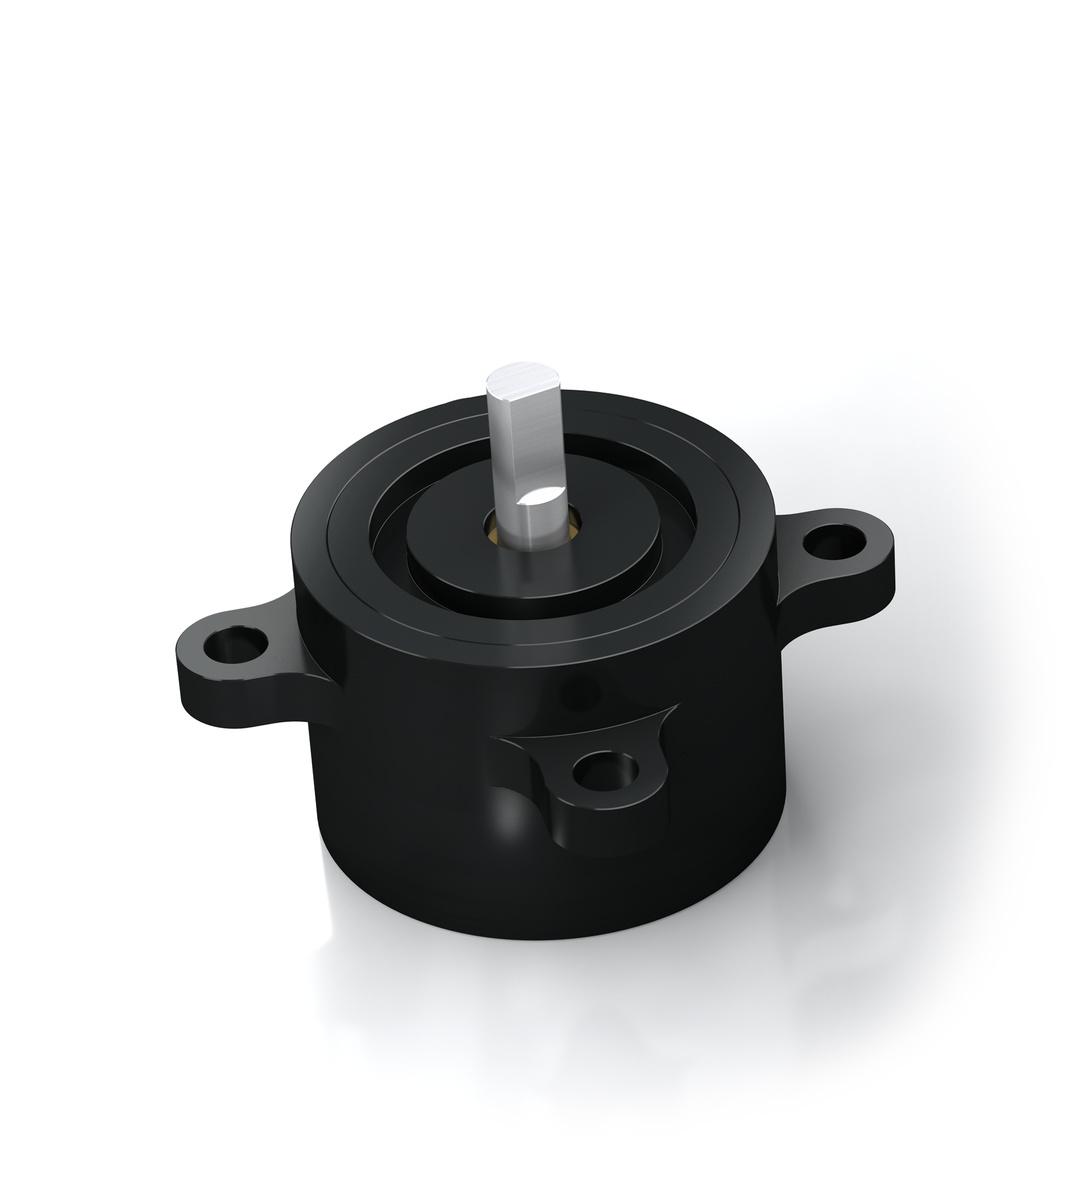 ACE Stoßdämpfer GmbH - Bild - FRT-F2/K2 und FRN-F2/K2